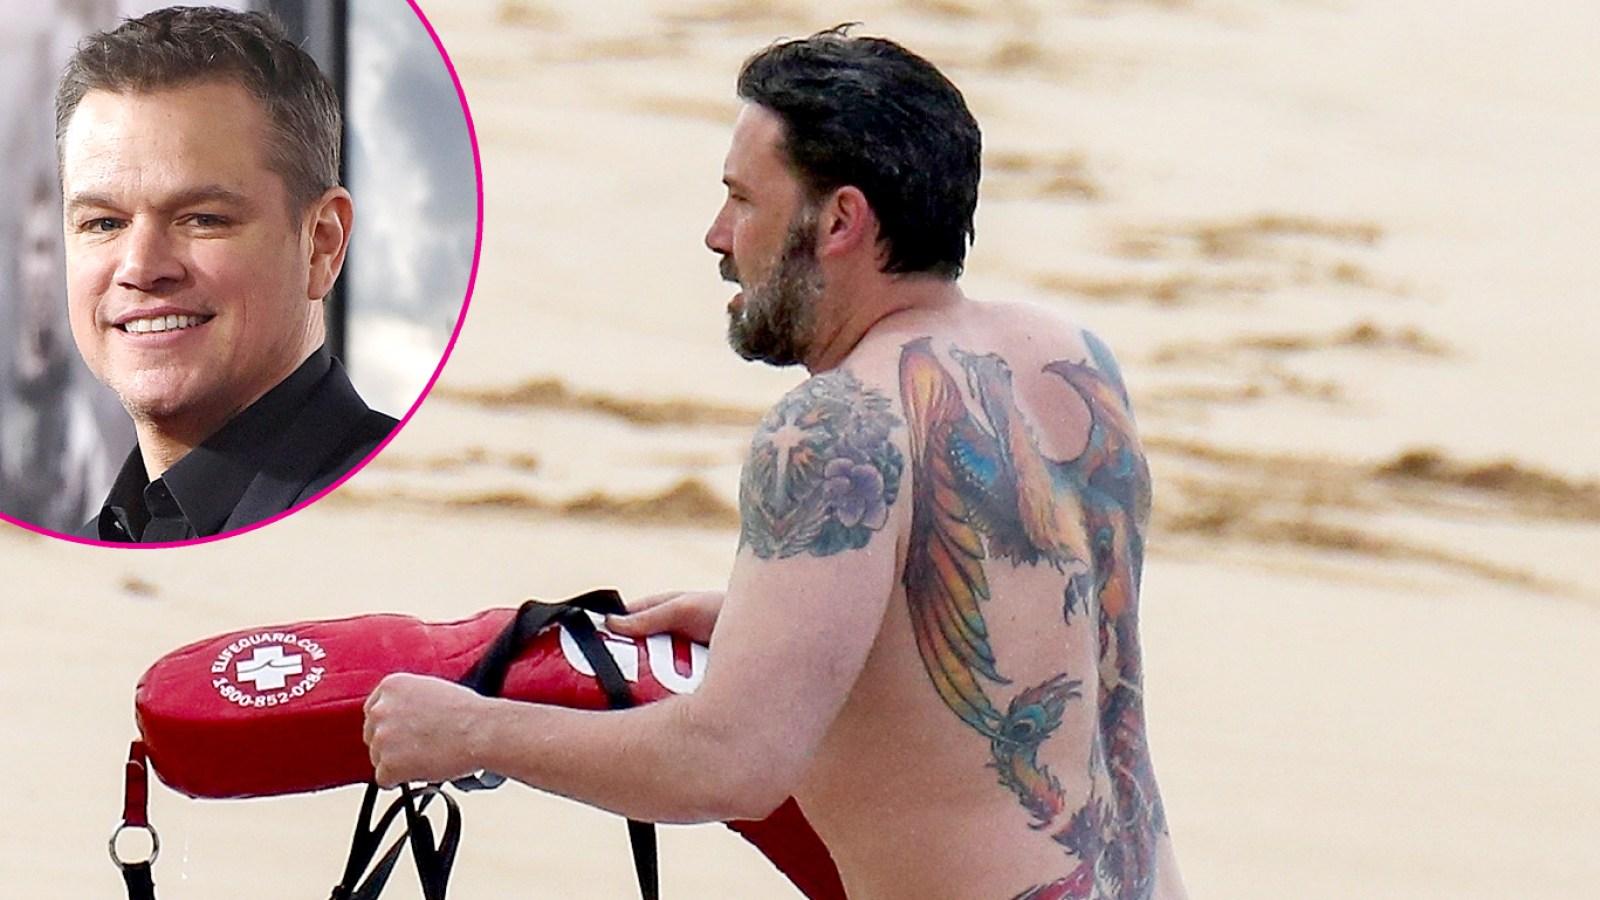 50e87188e90ee Matt Damon Reacts to His BFF Ben Affleck's Massive Back Tattoo